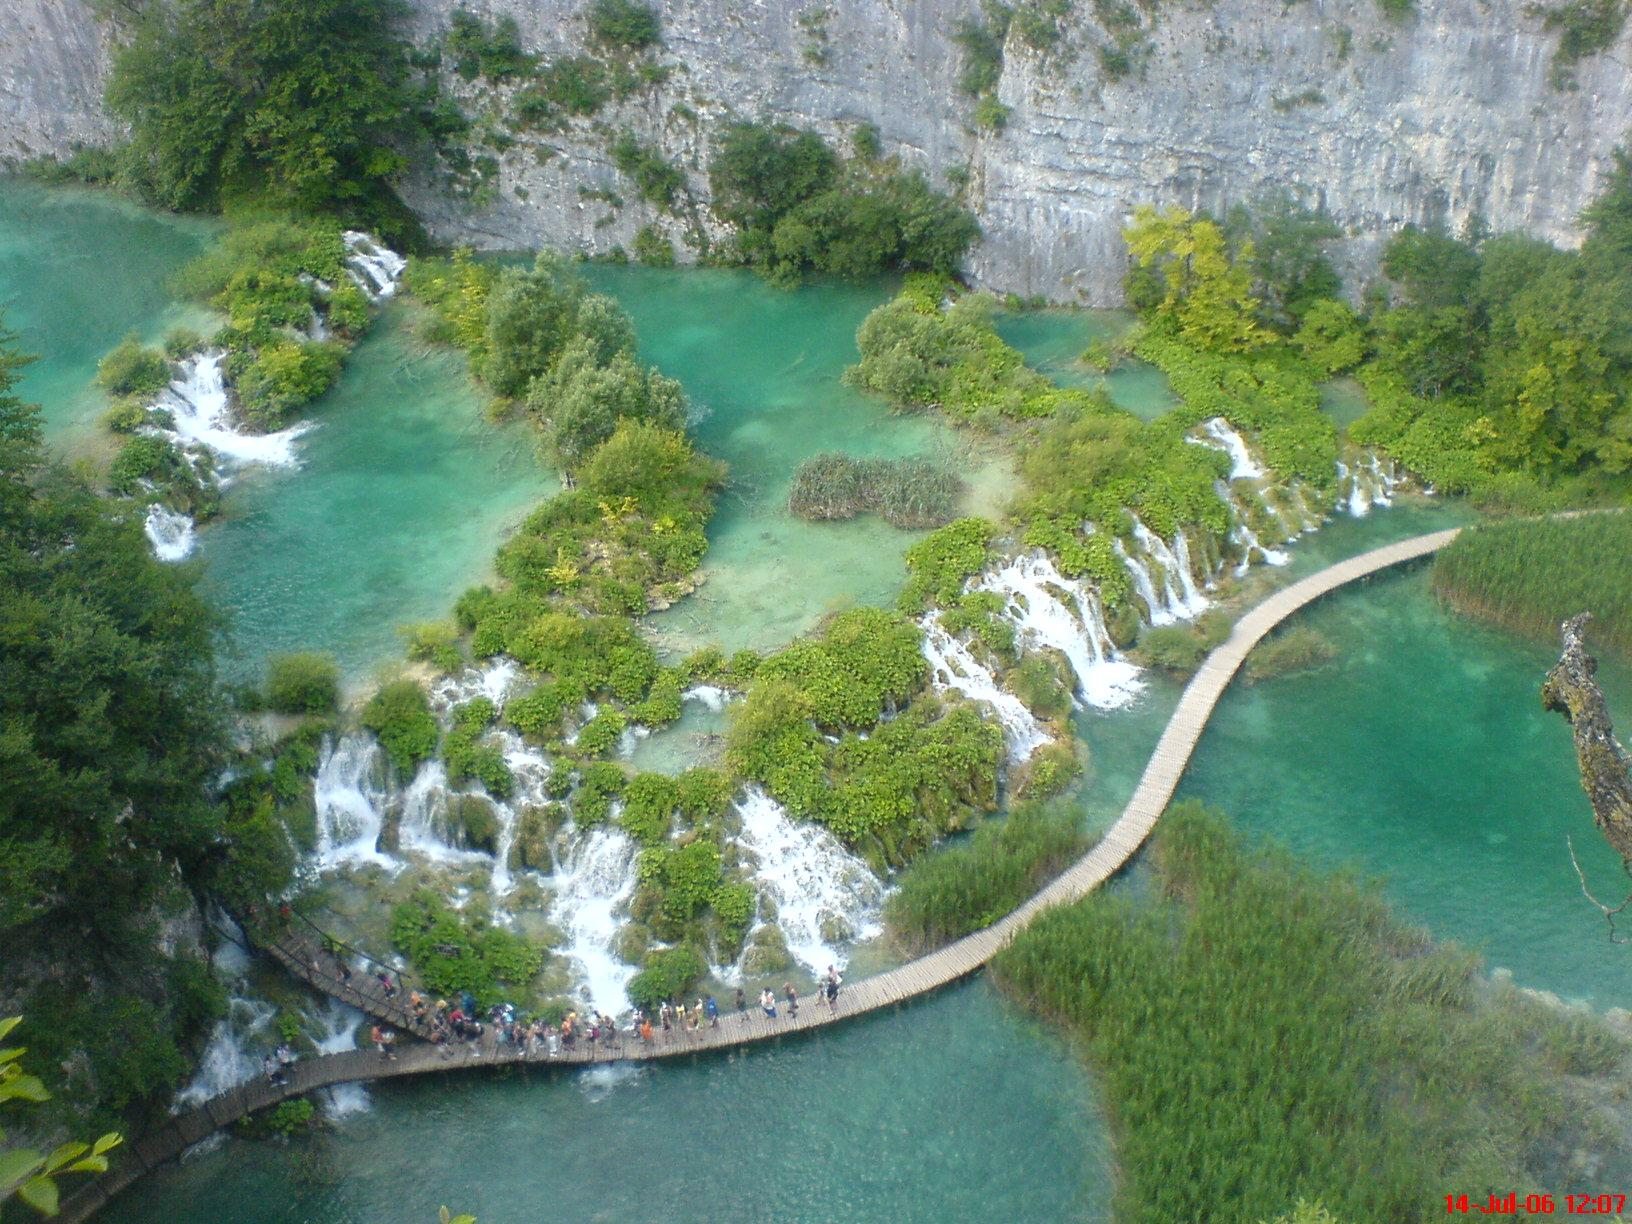 Parc national des lacs de Plitvice - Plitvička jezera